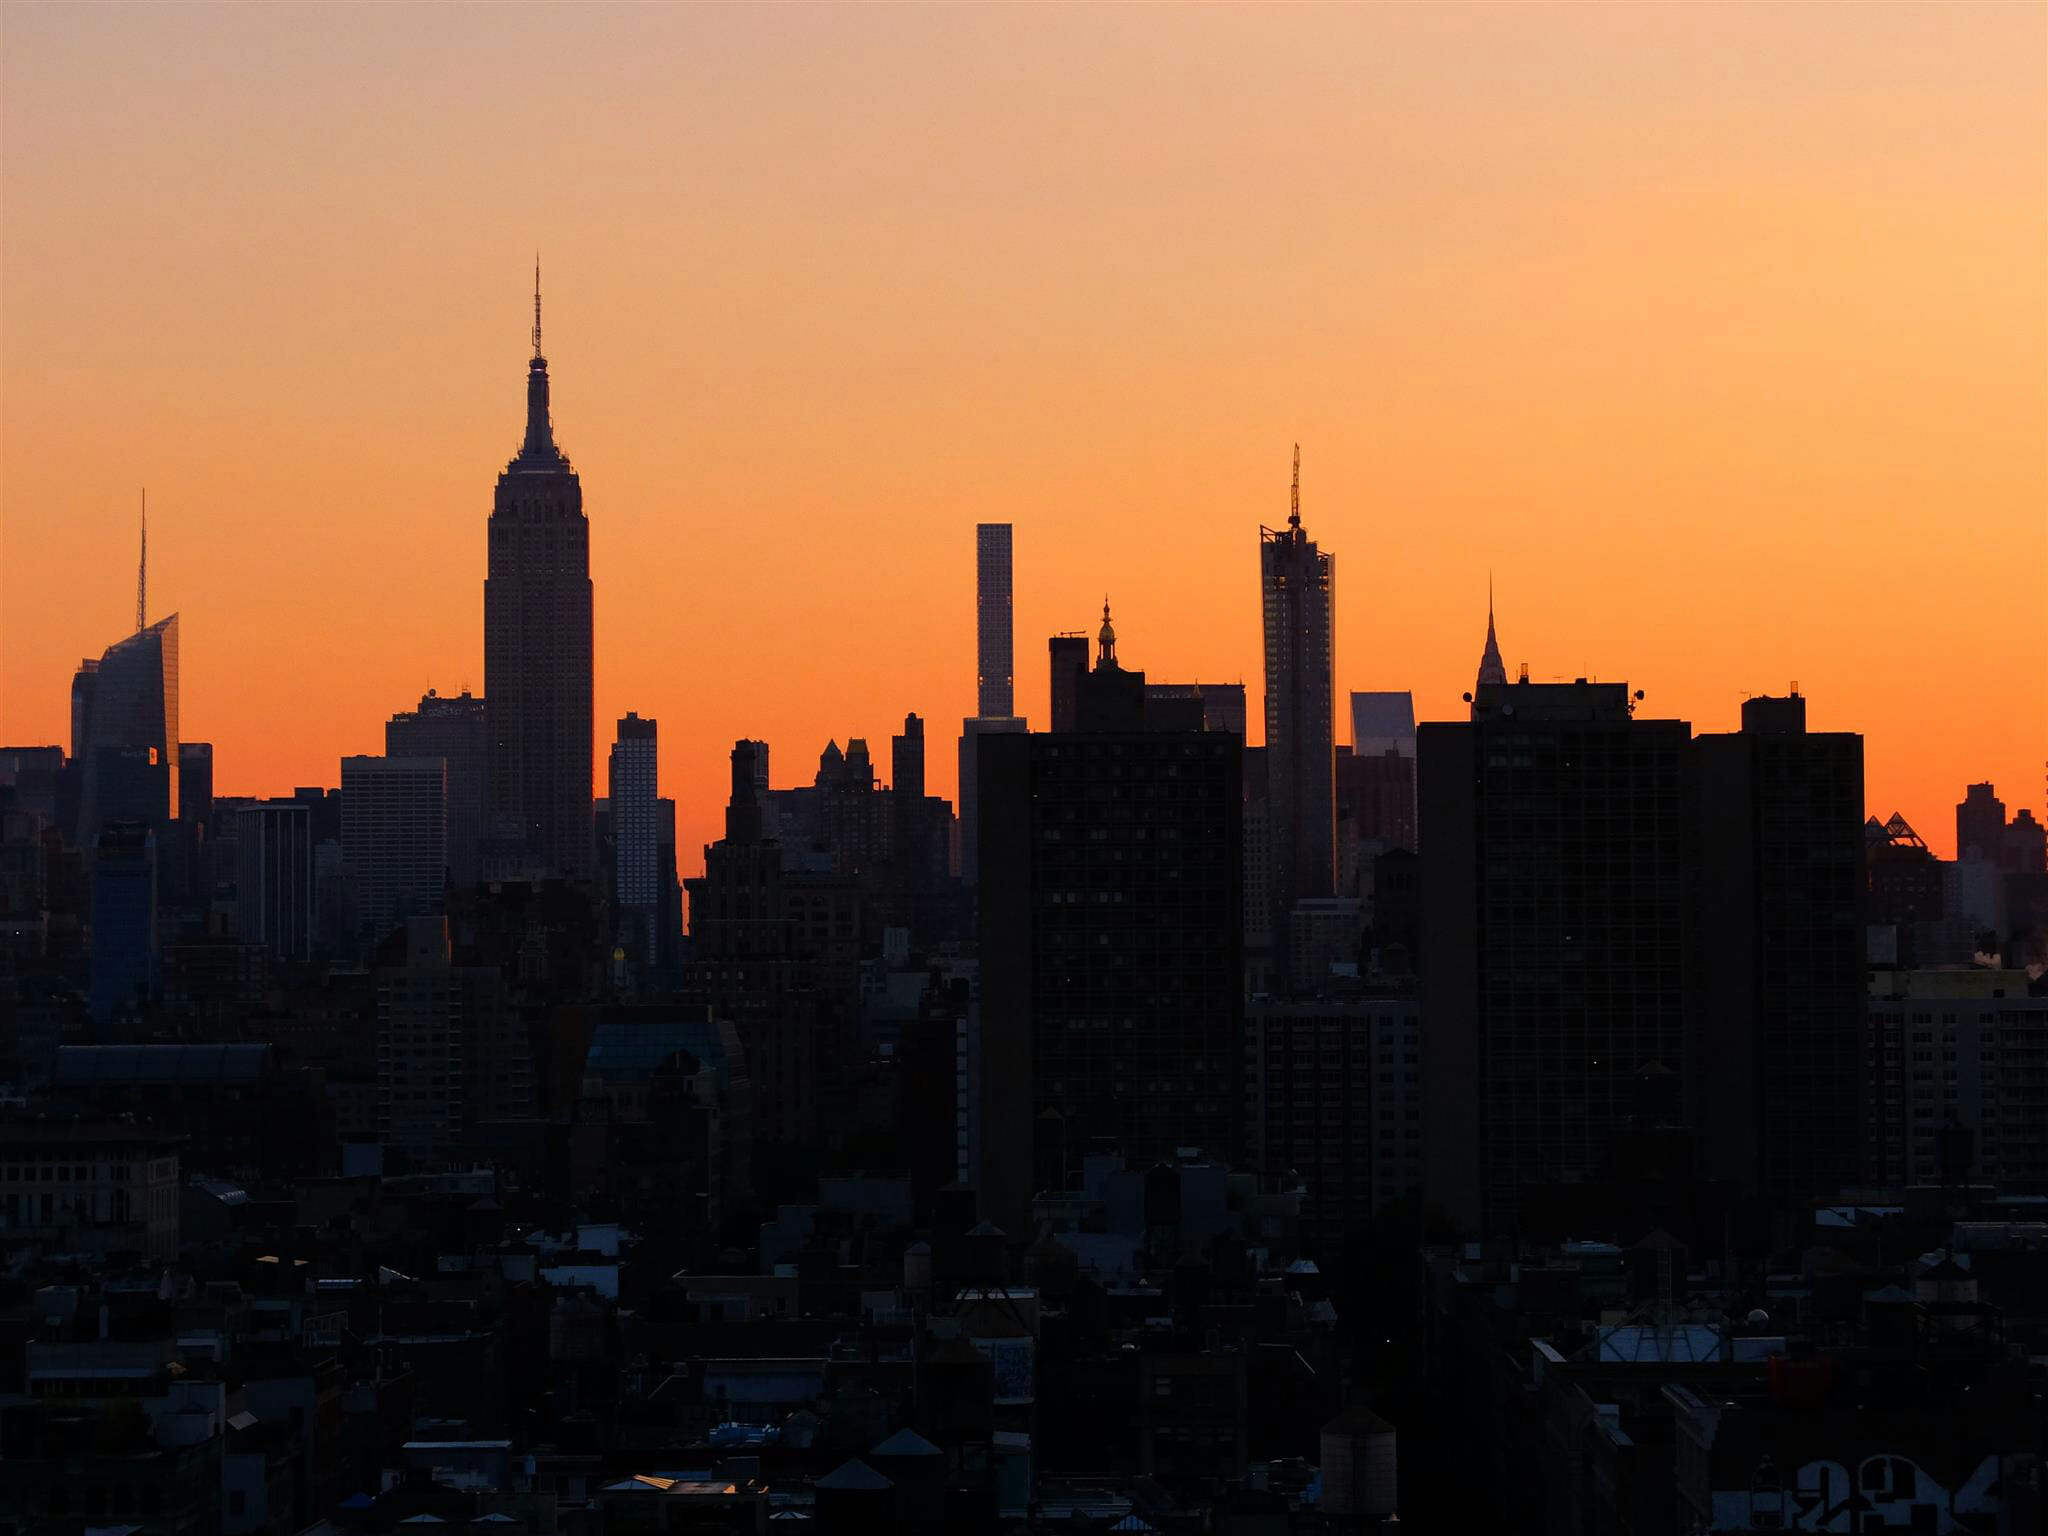 Sunrise in New York High Quality Wallpaper